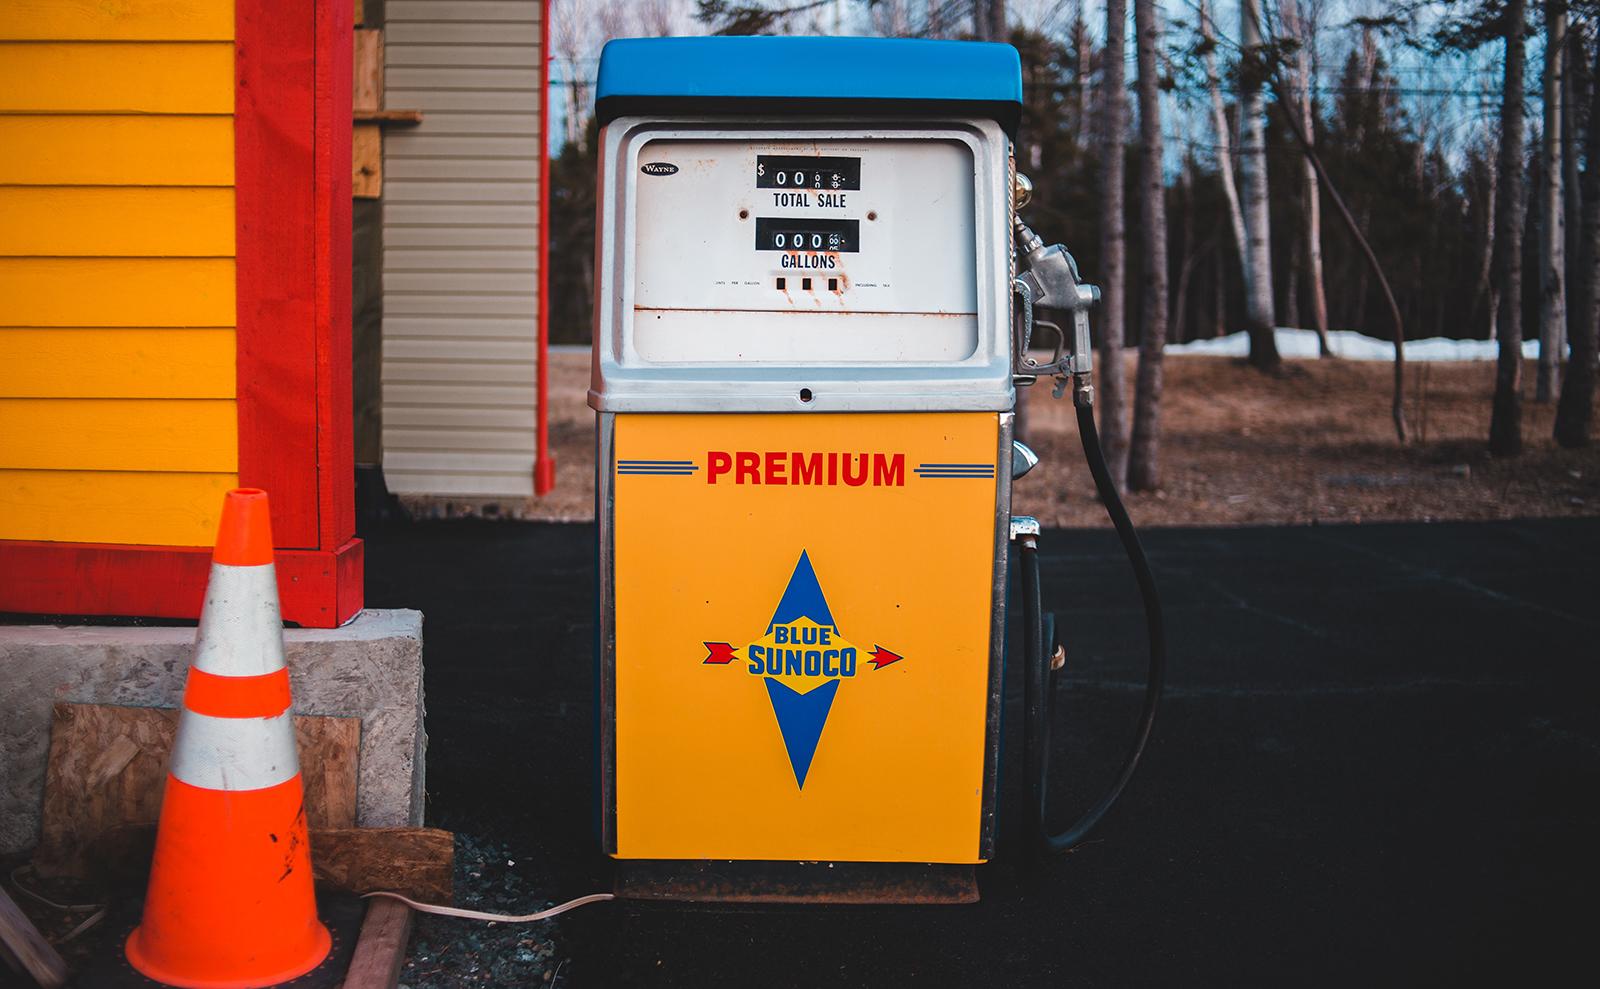 vintage gas pump at a rural gas station